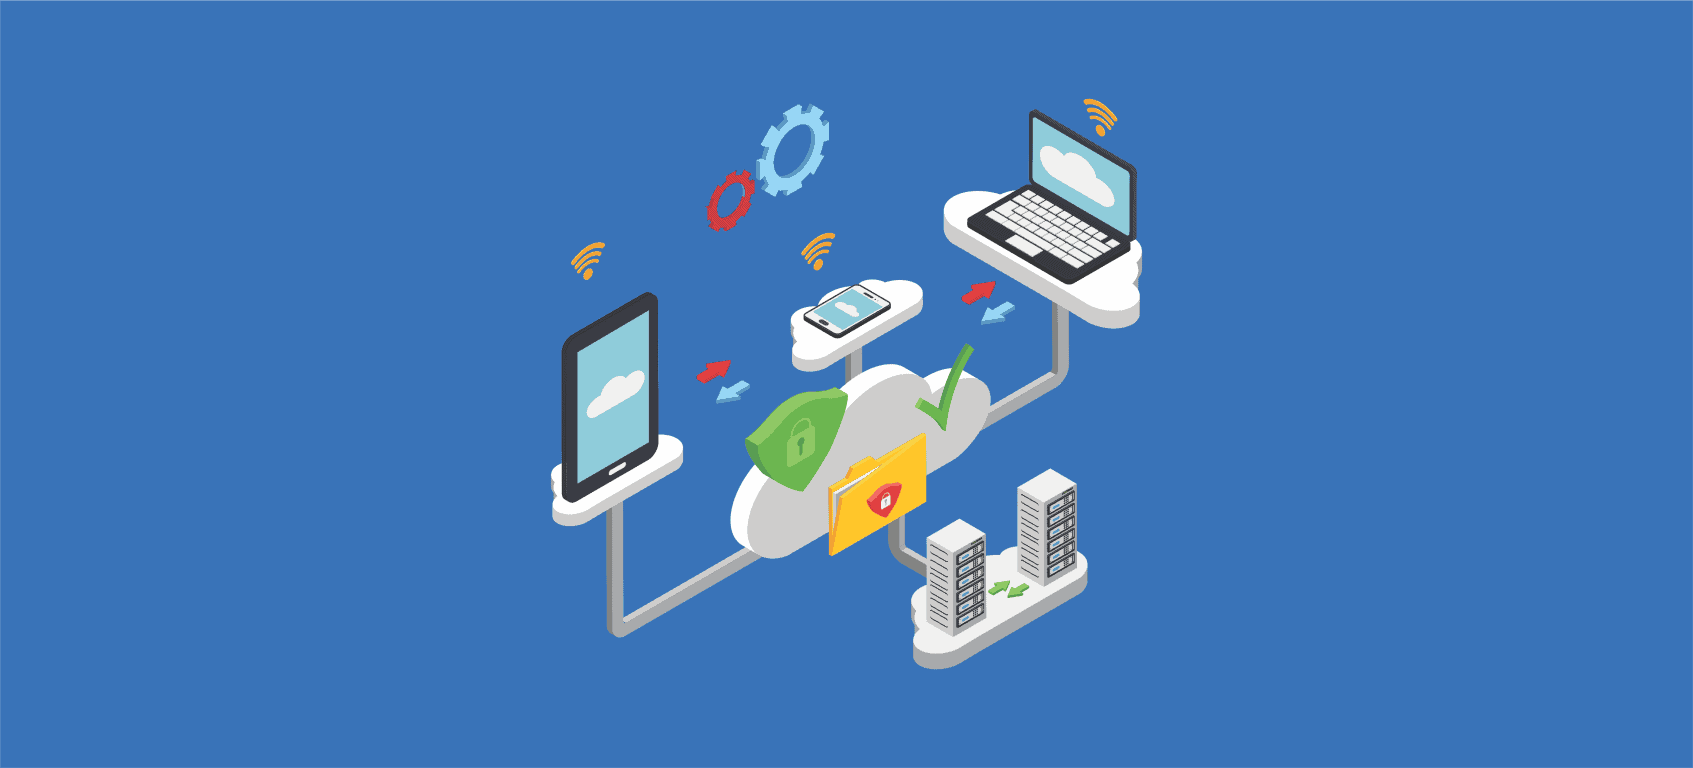 acessibilidade cloud computing